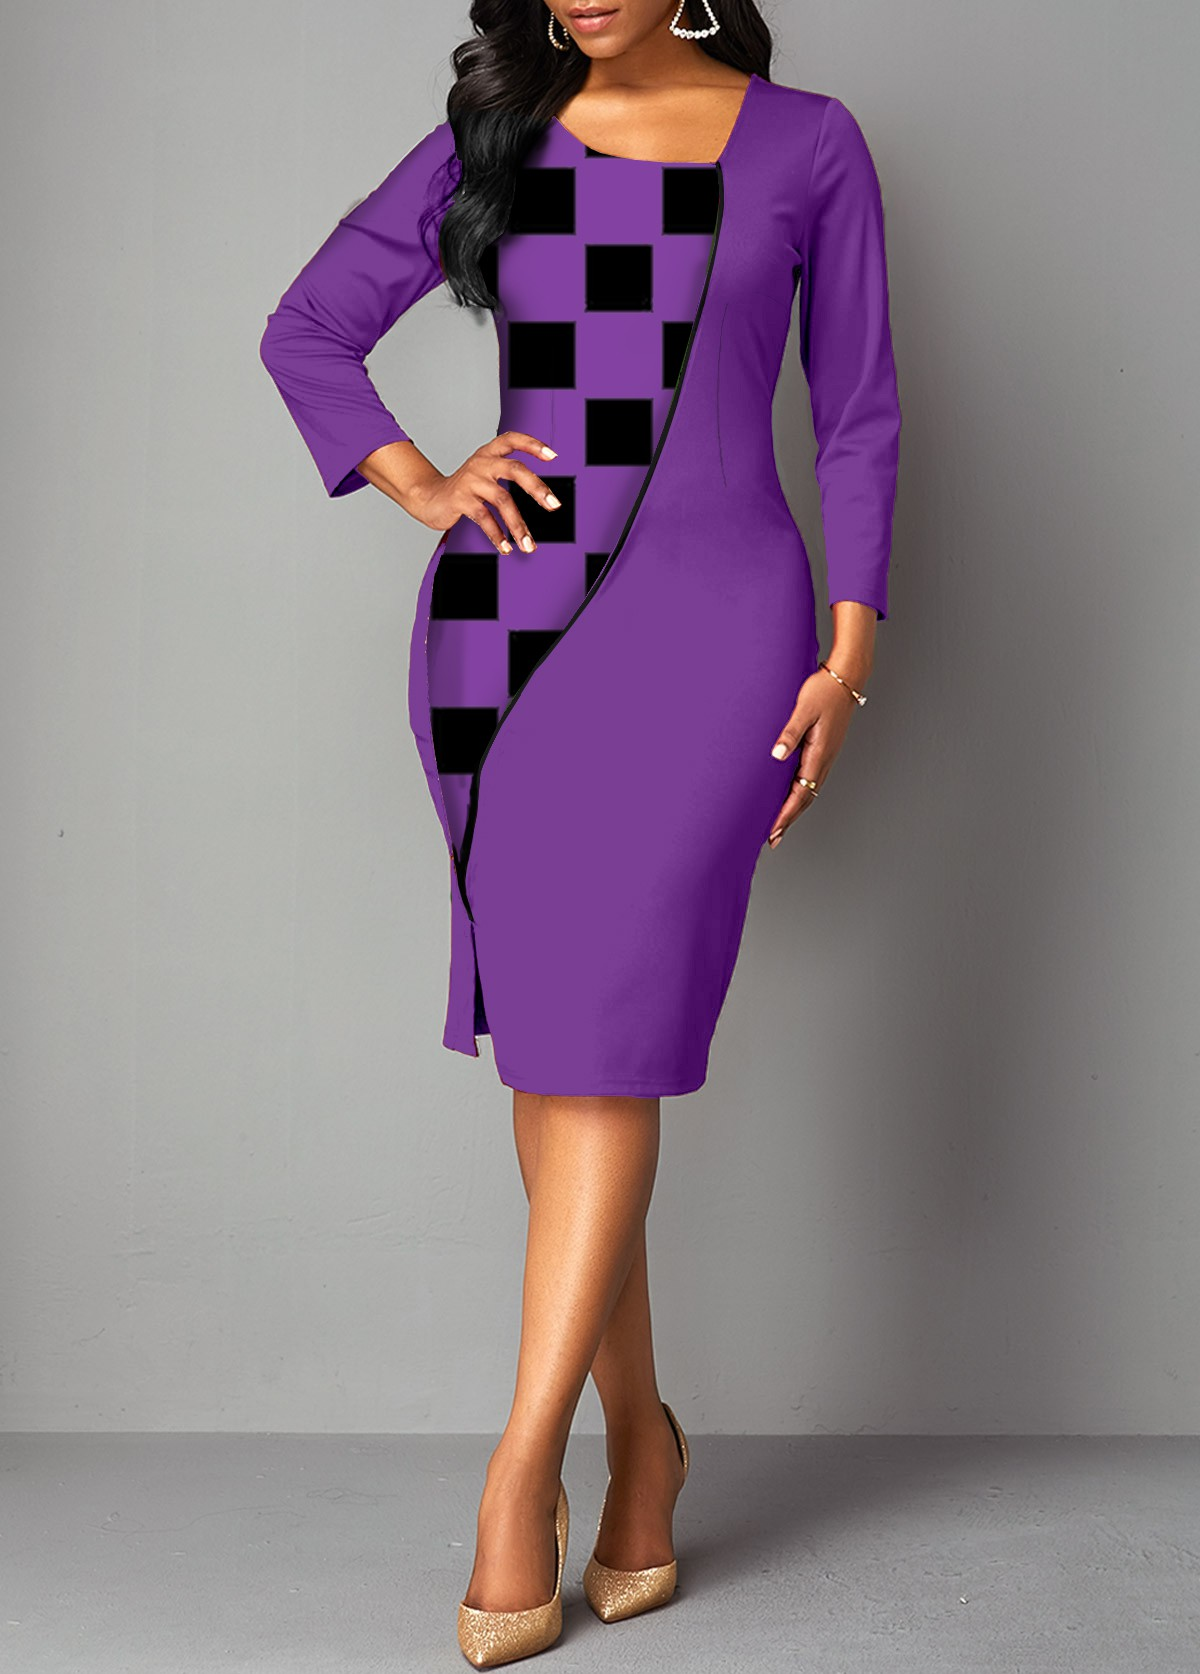 3/4 Sleeve Asymmetrical Neck Plaid Dress